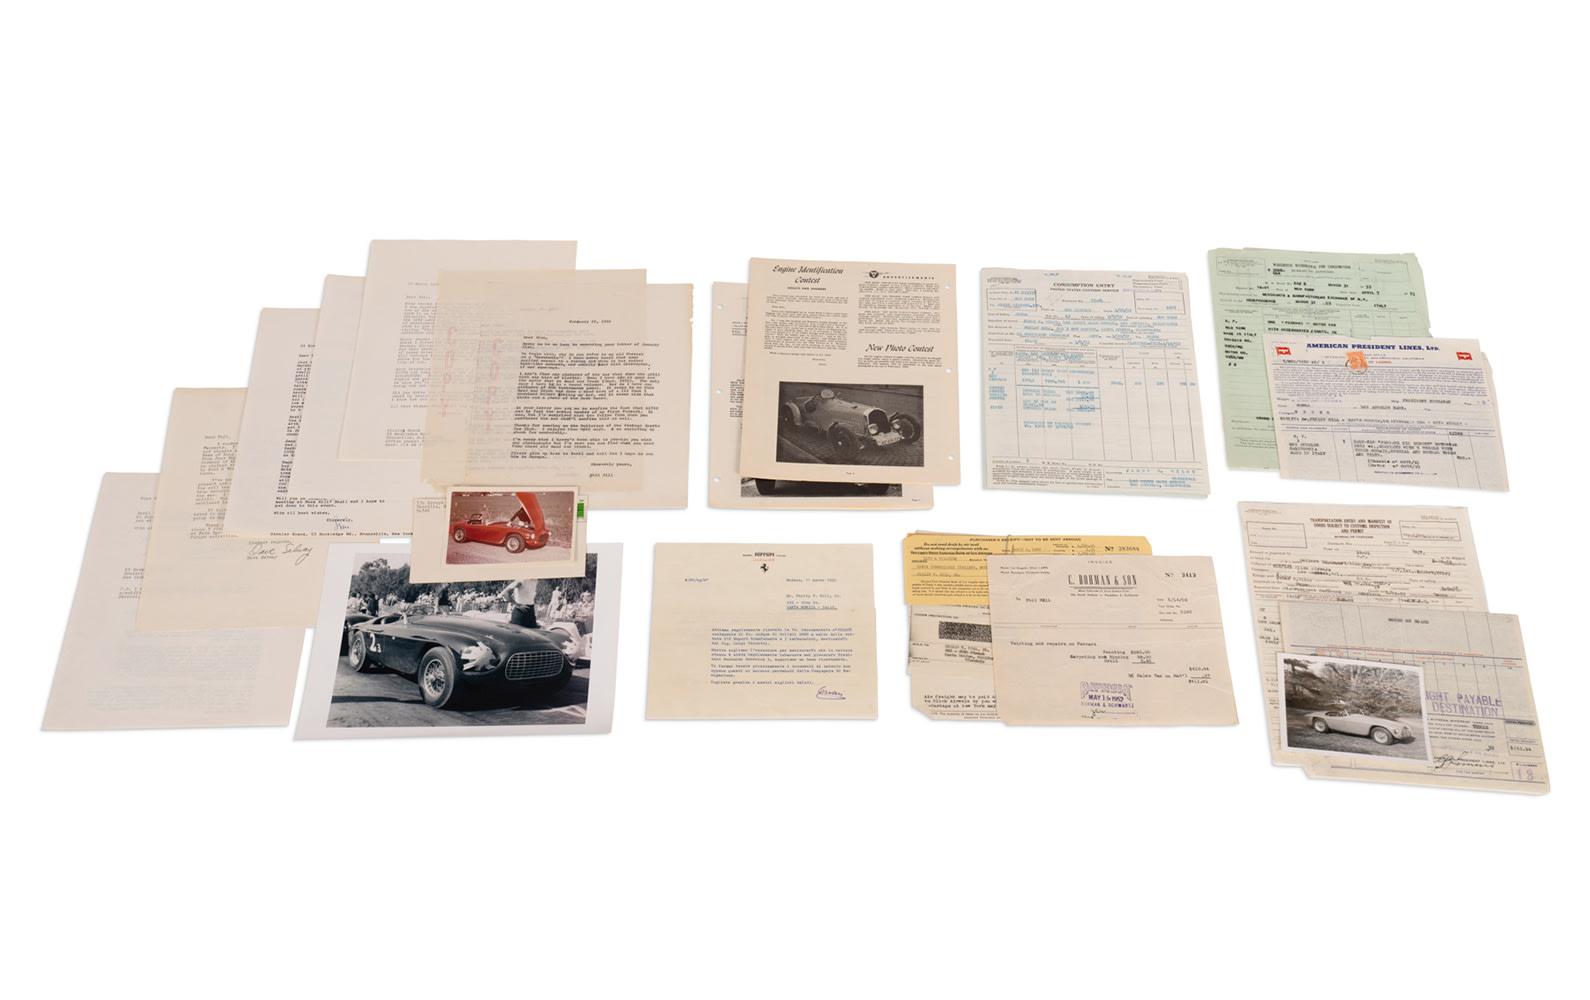 Assorted Correspondence and Files Regarding Phil Hill's Ferrari 212 Export Barchetta, Chassis 0078/E